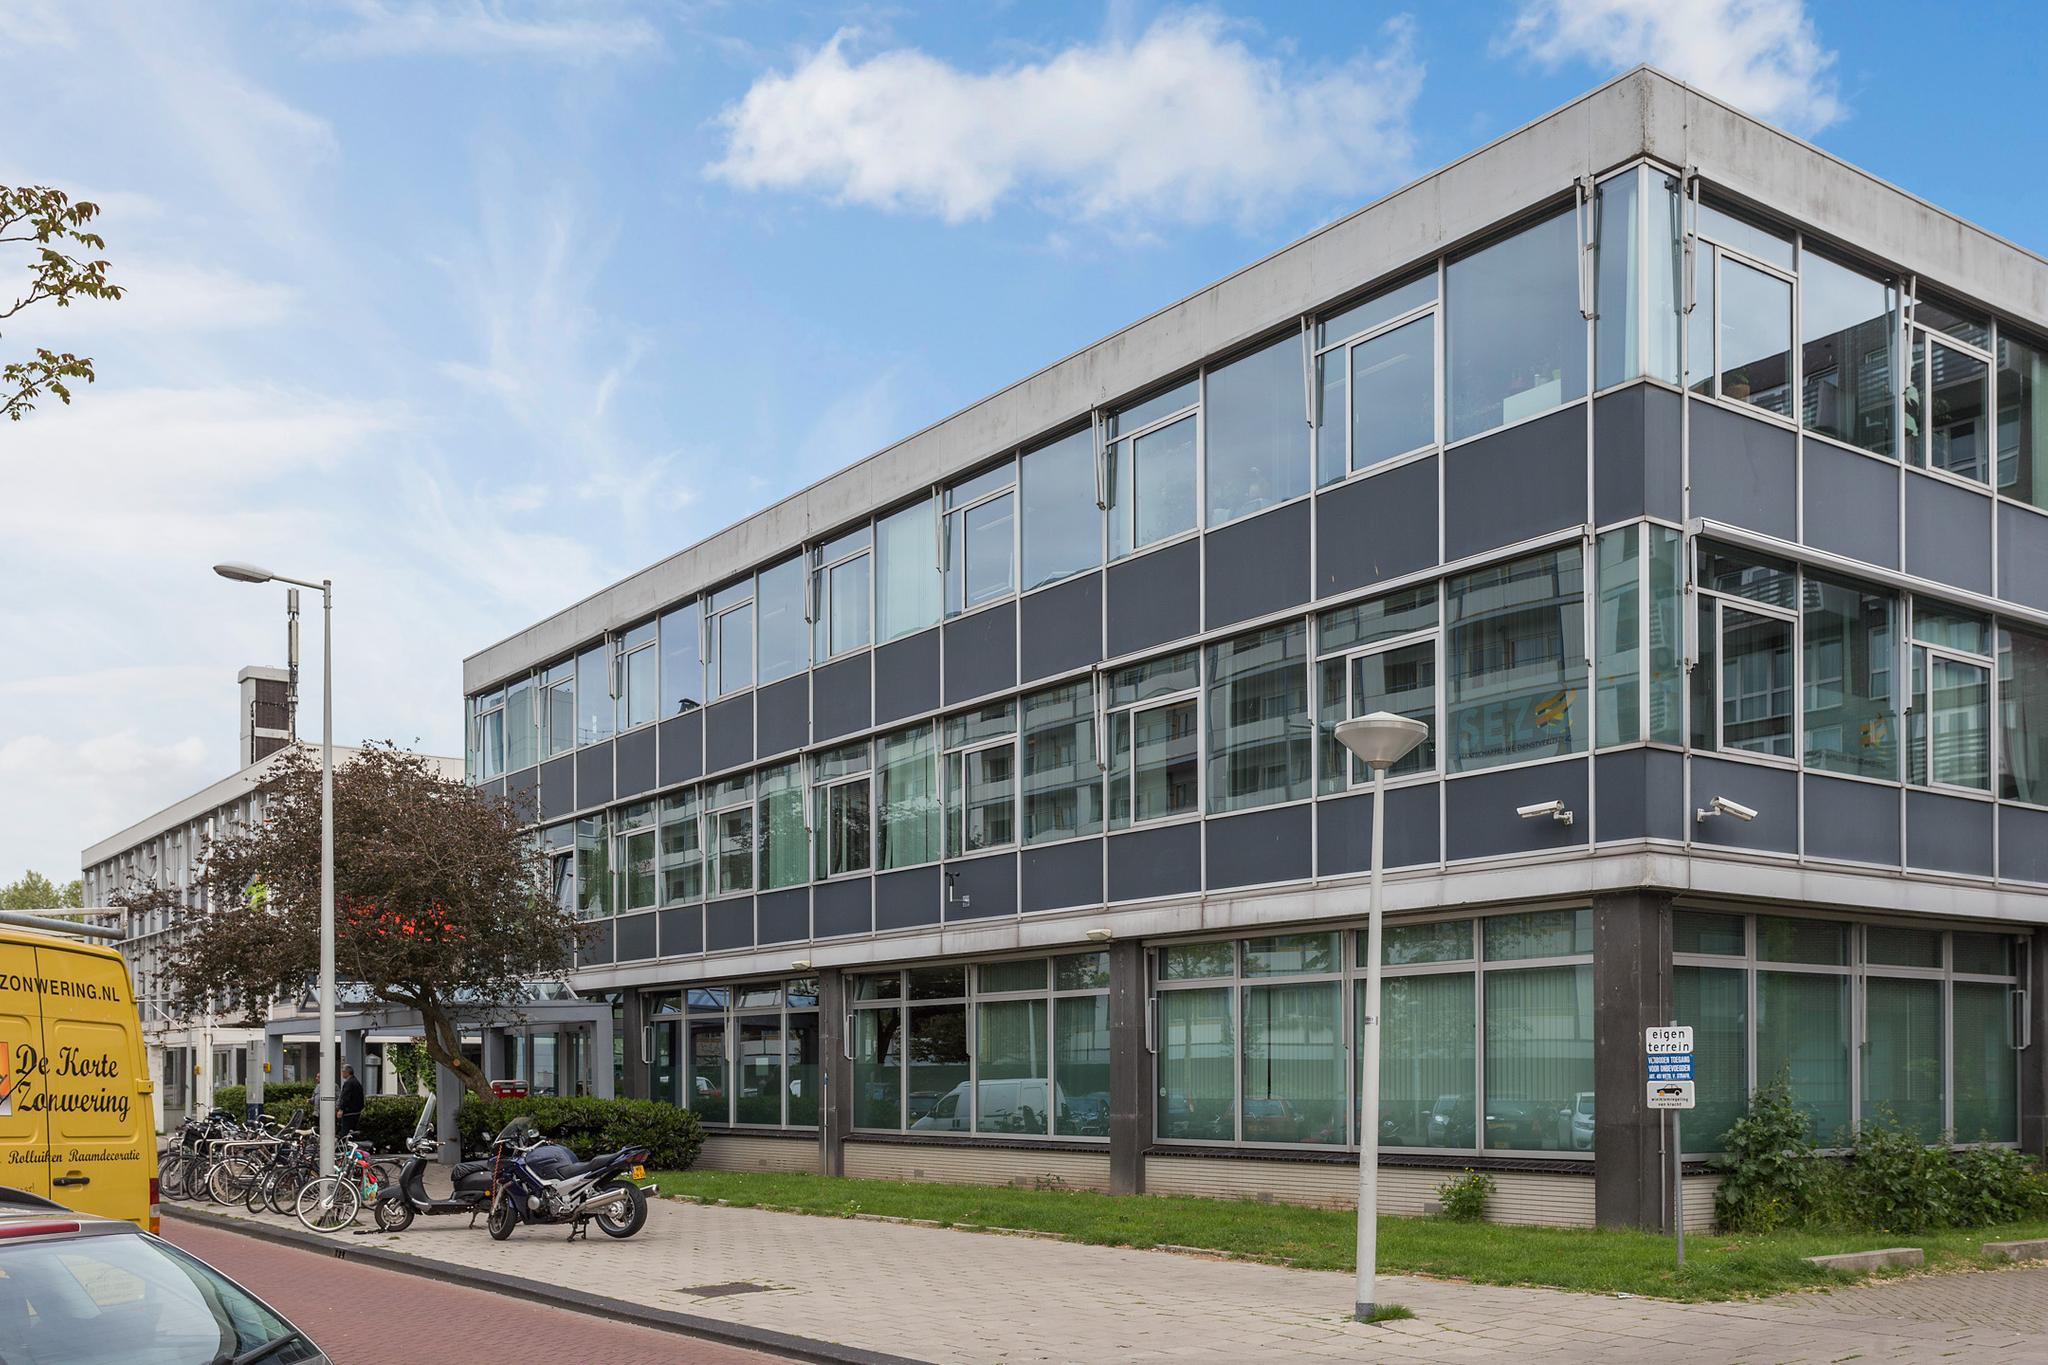 Ottho Heldringstraat 5 in Amsterdam 1066 AZ Kantoorruimte KS Bedrijfsmakelaars